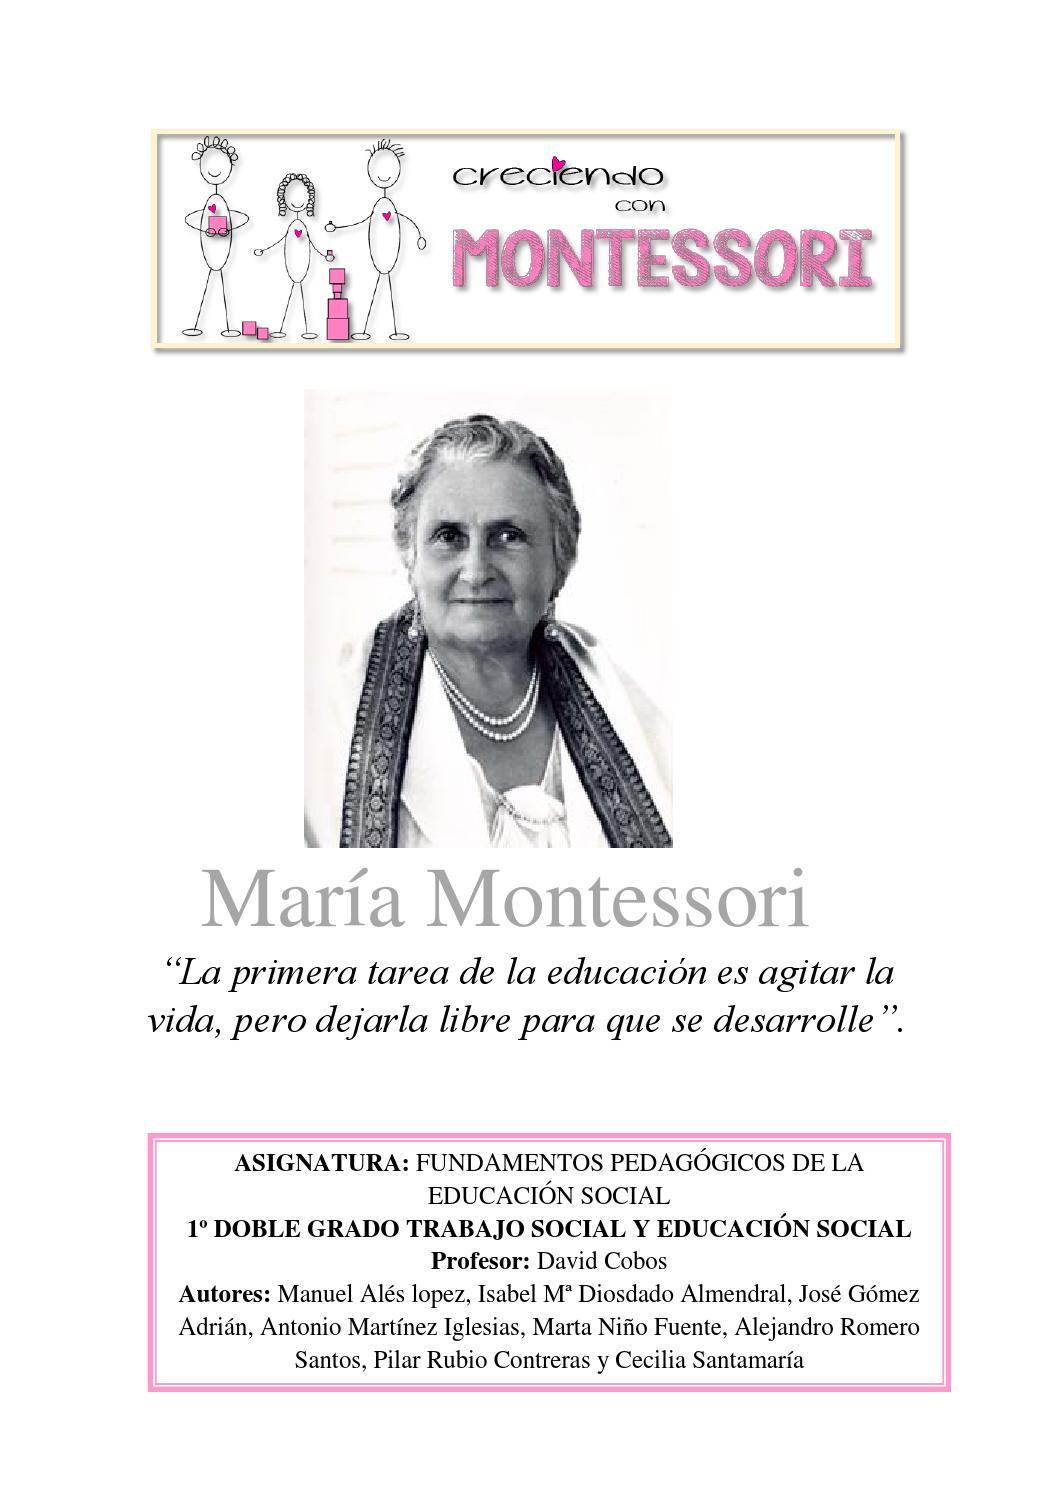 Montessori final by Isabel Mª Diosdado Almendral - issuu